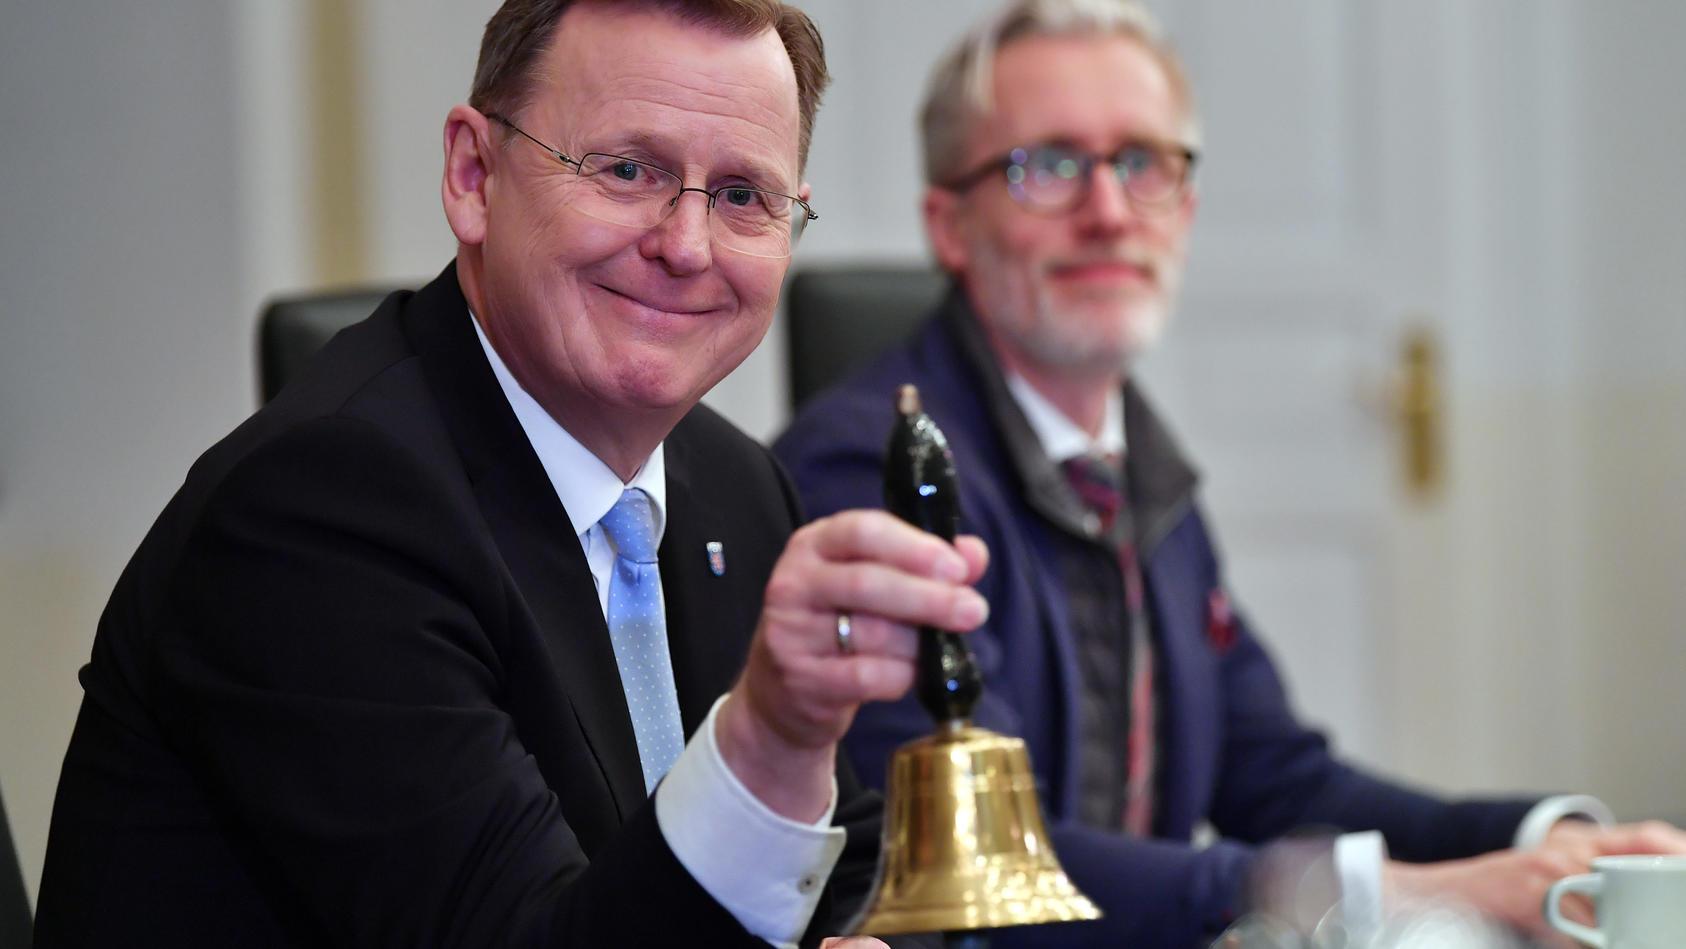 Ministerpräsidentenwahl in Thüringen - Erste Kabinettsitzung